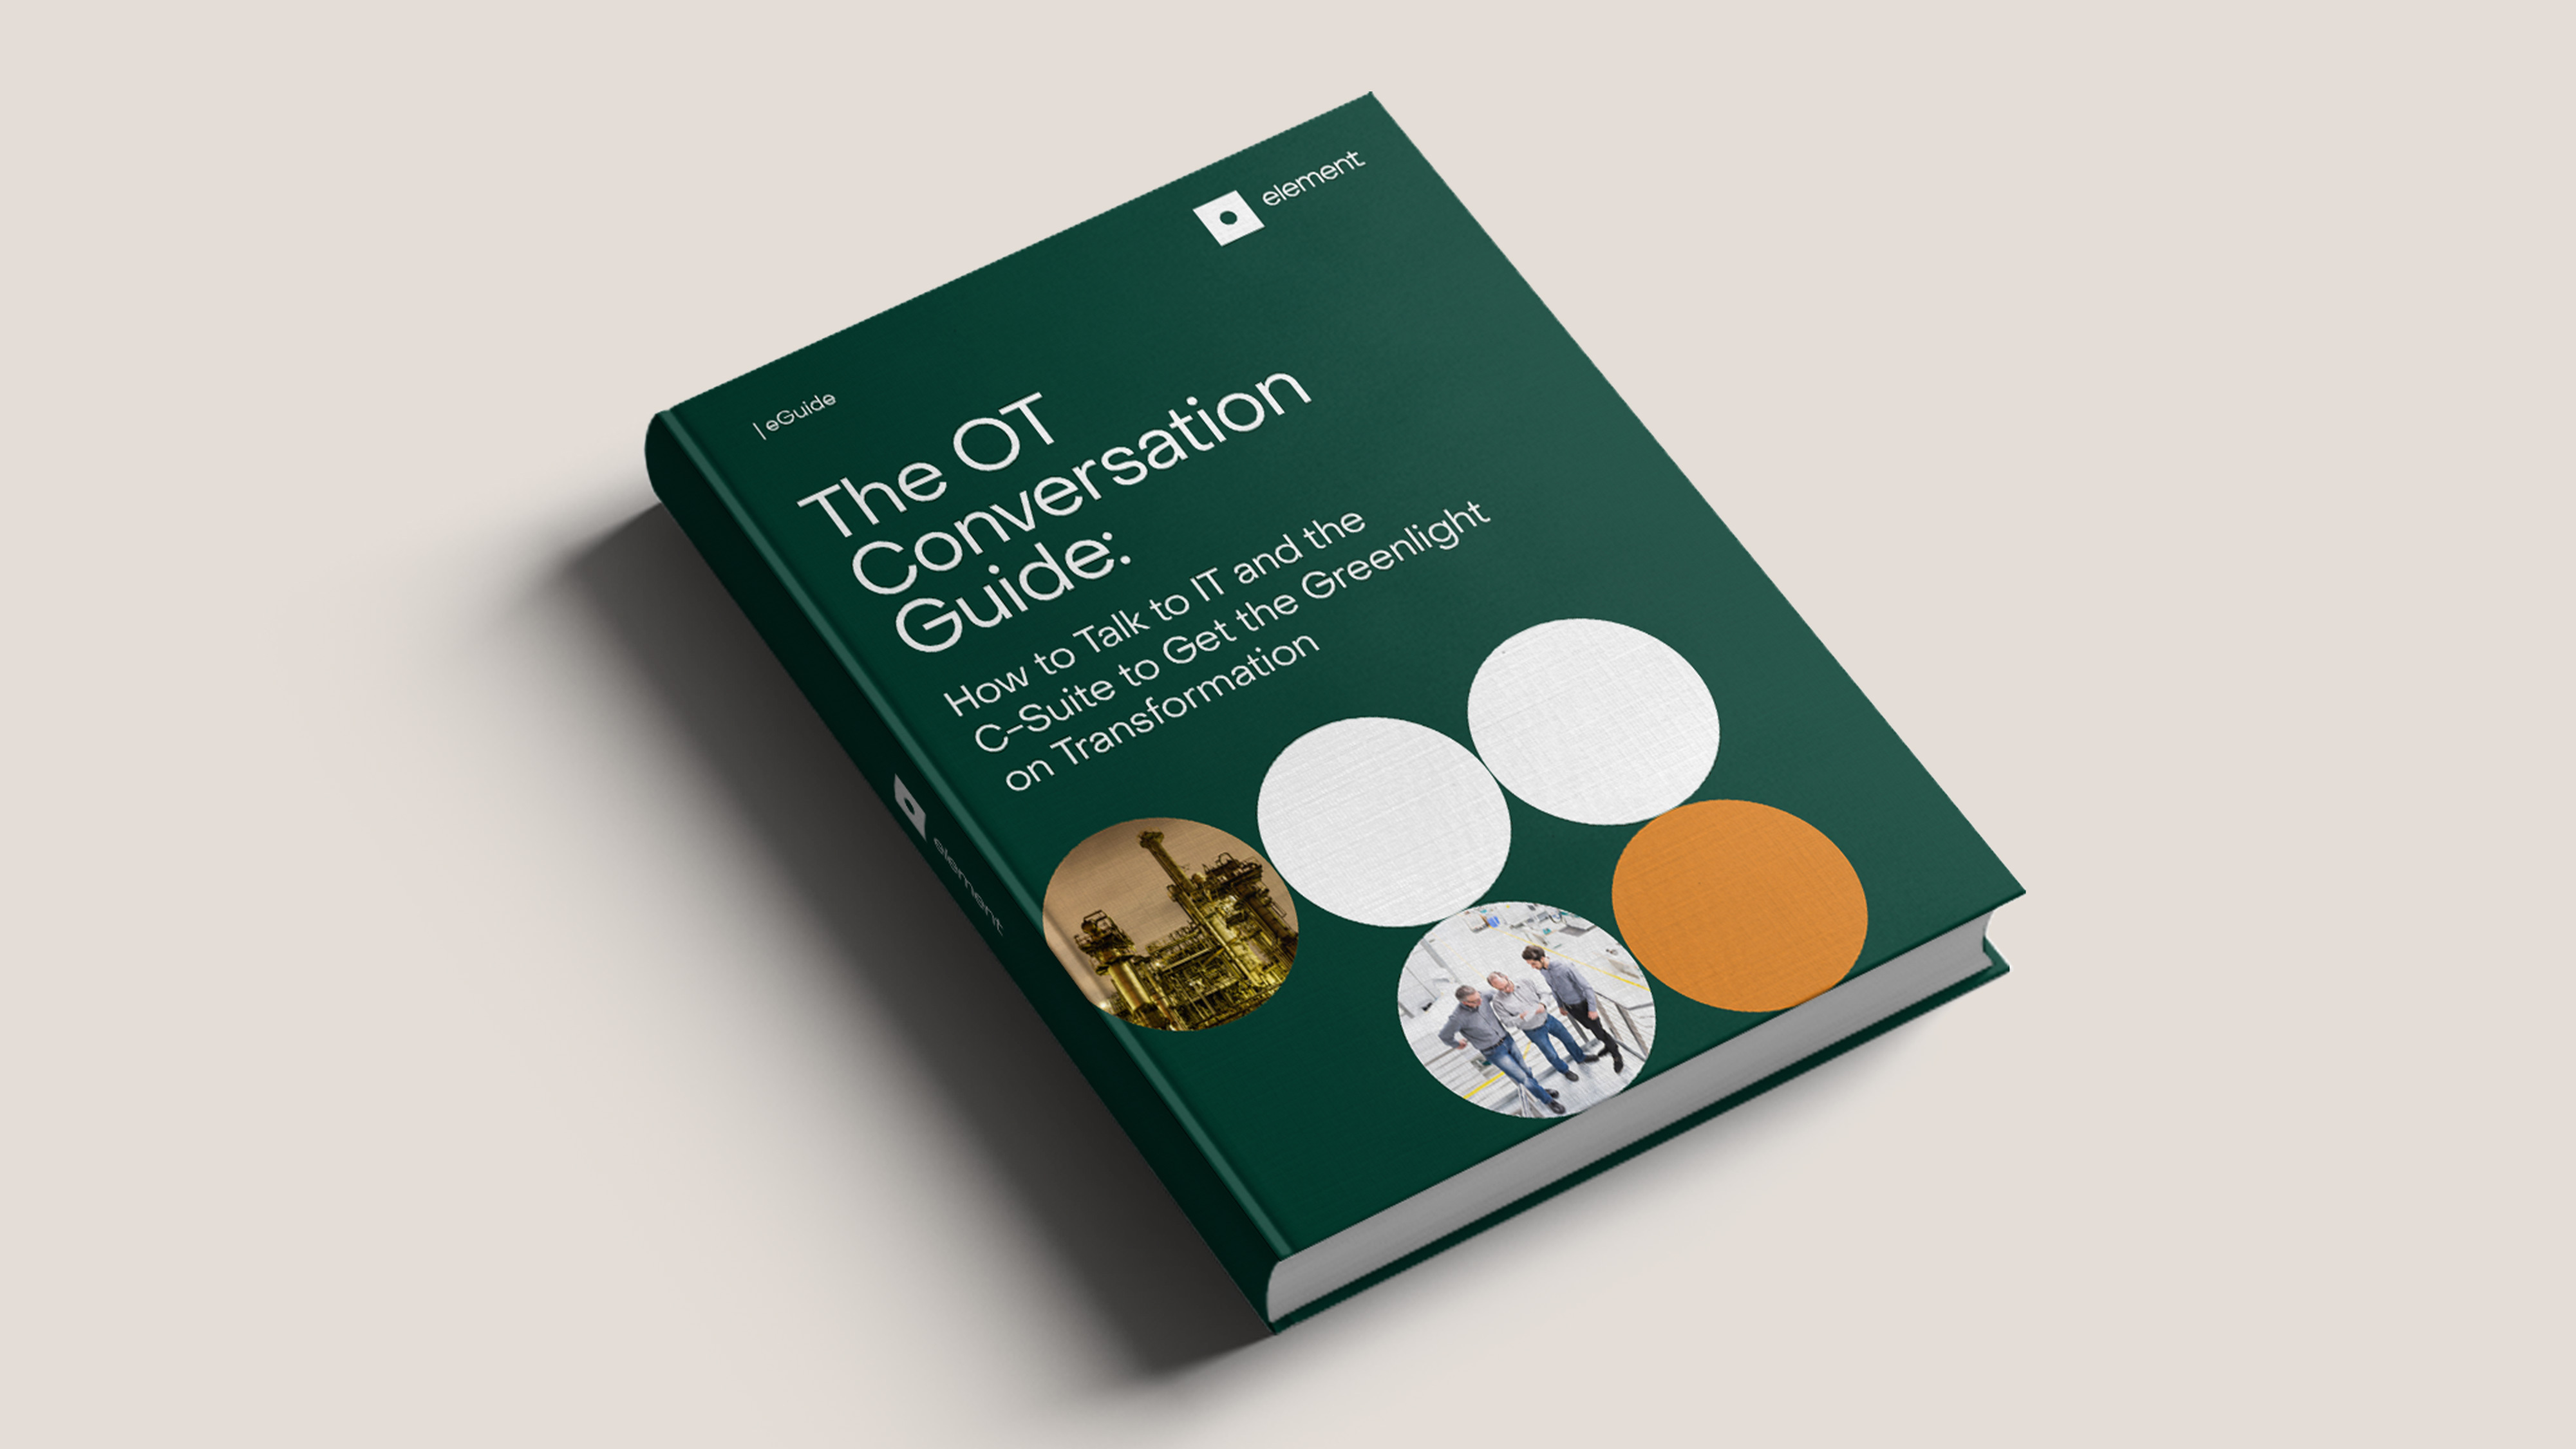 The OT Conversation Guide